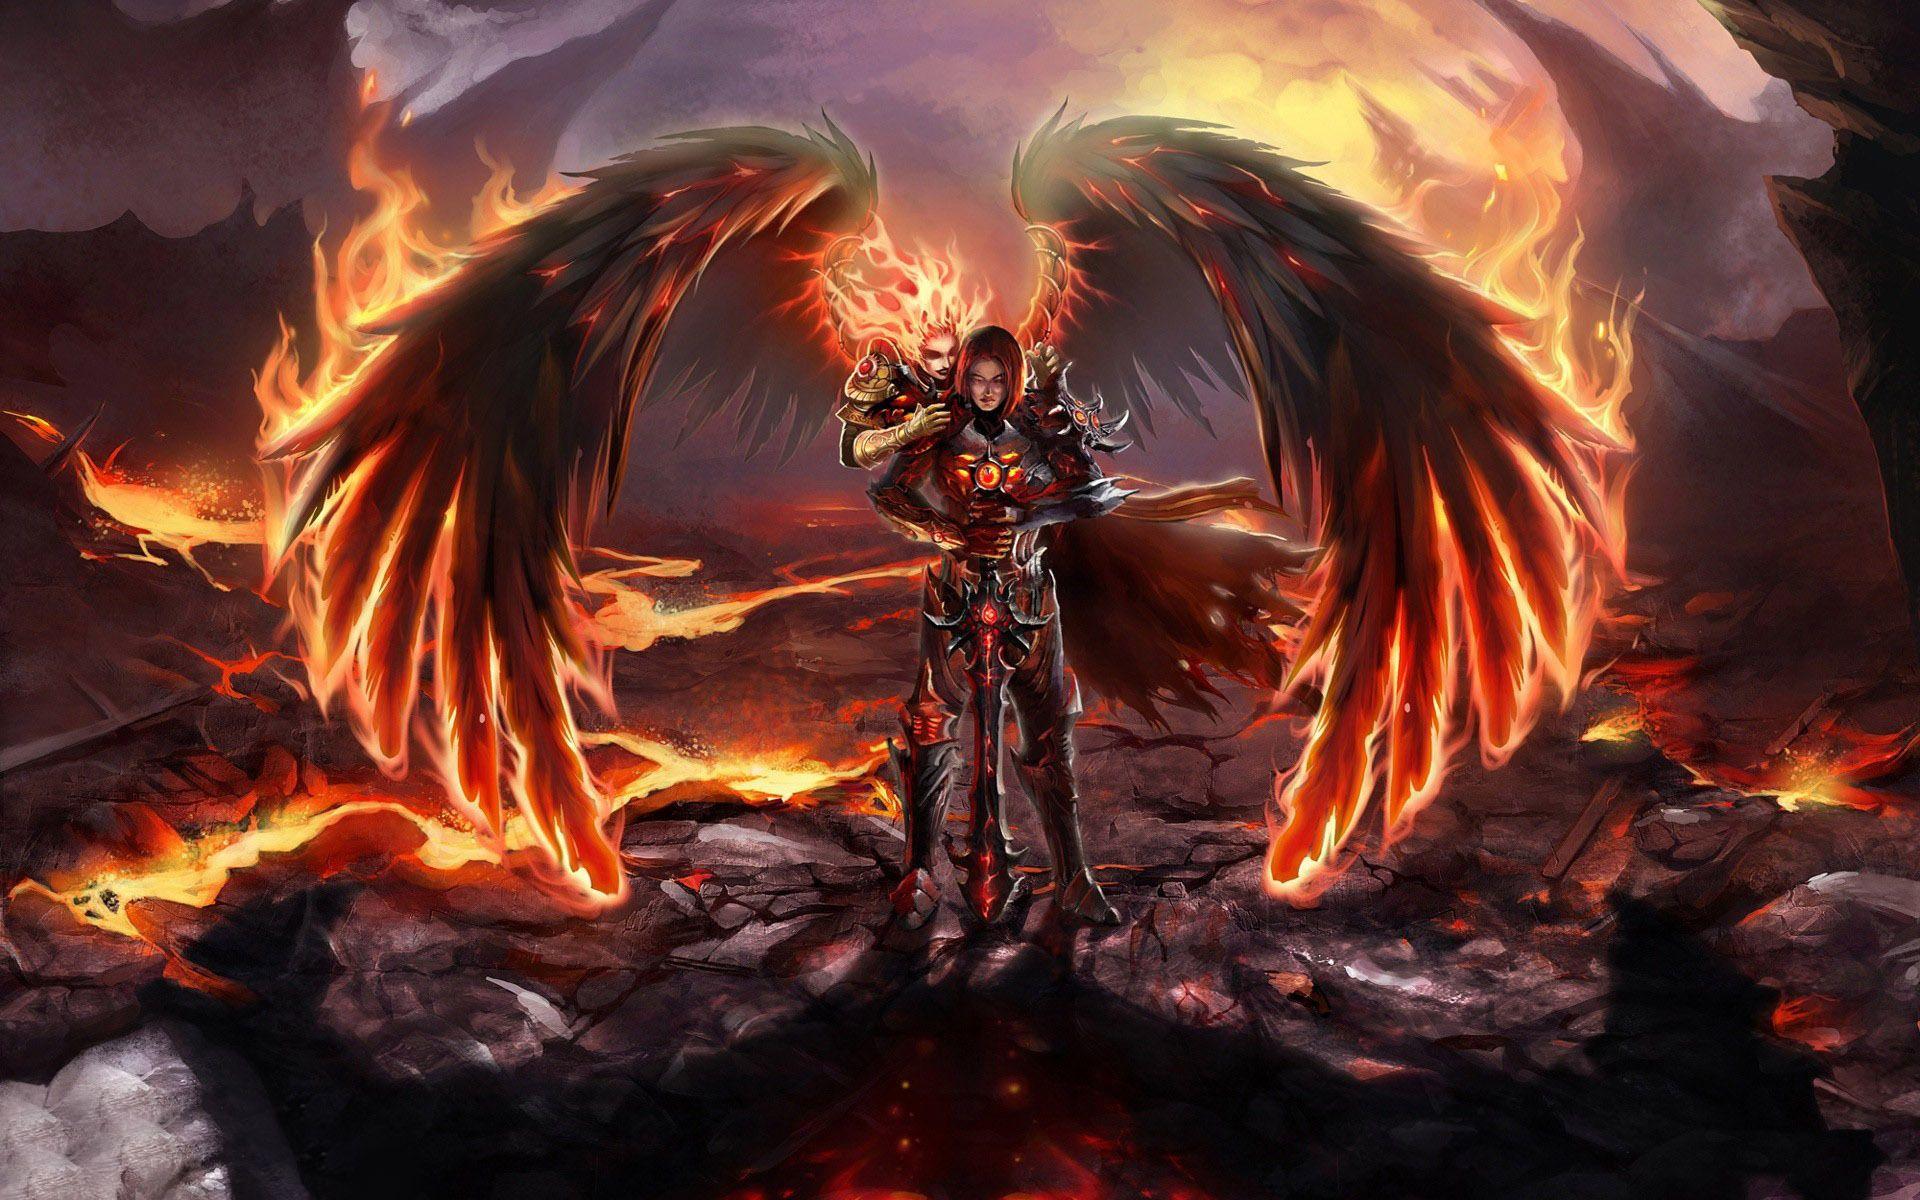 Must see Wallpaper Marvel Archangel - 1174cc8bf595838d73e74b48d03fcf41  Graphic_93861.jpg